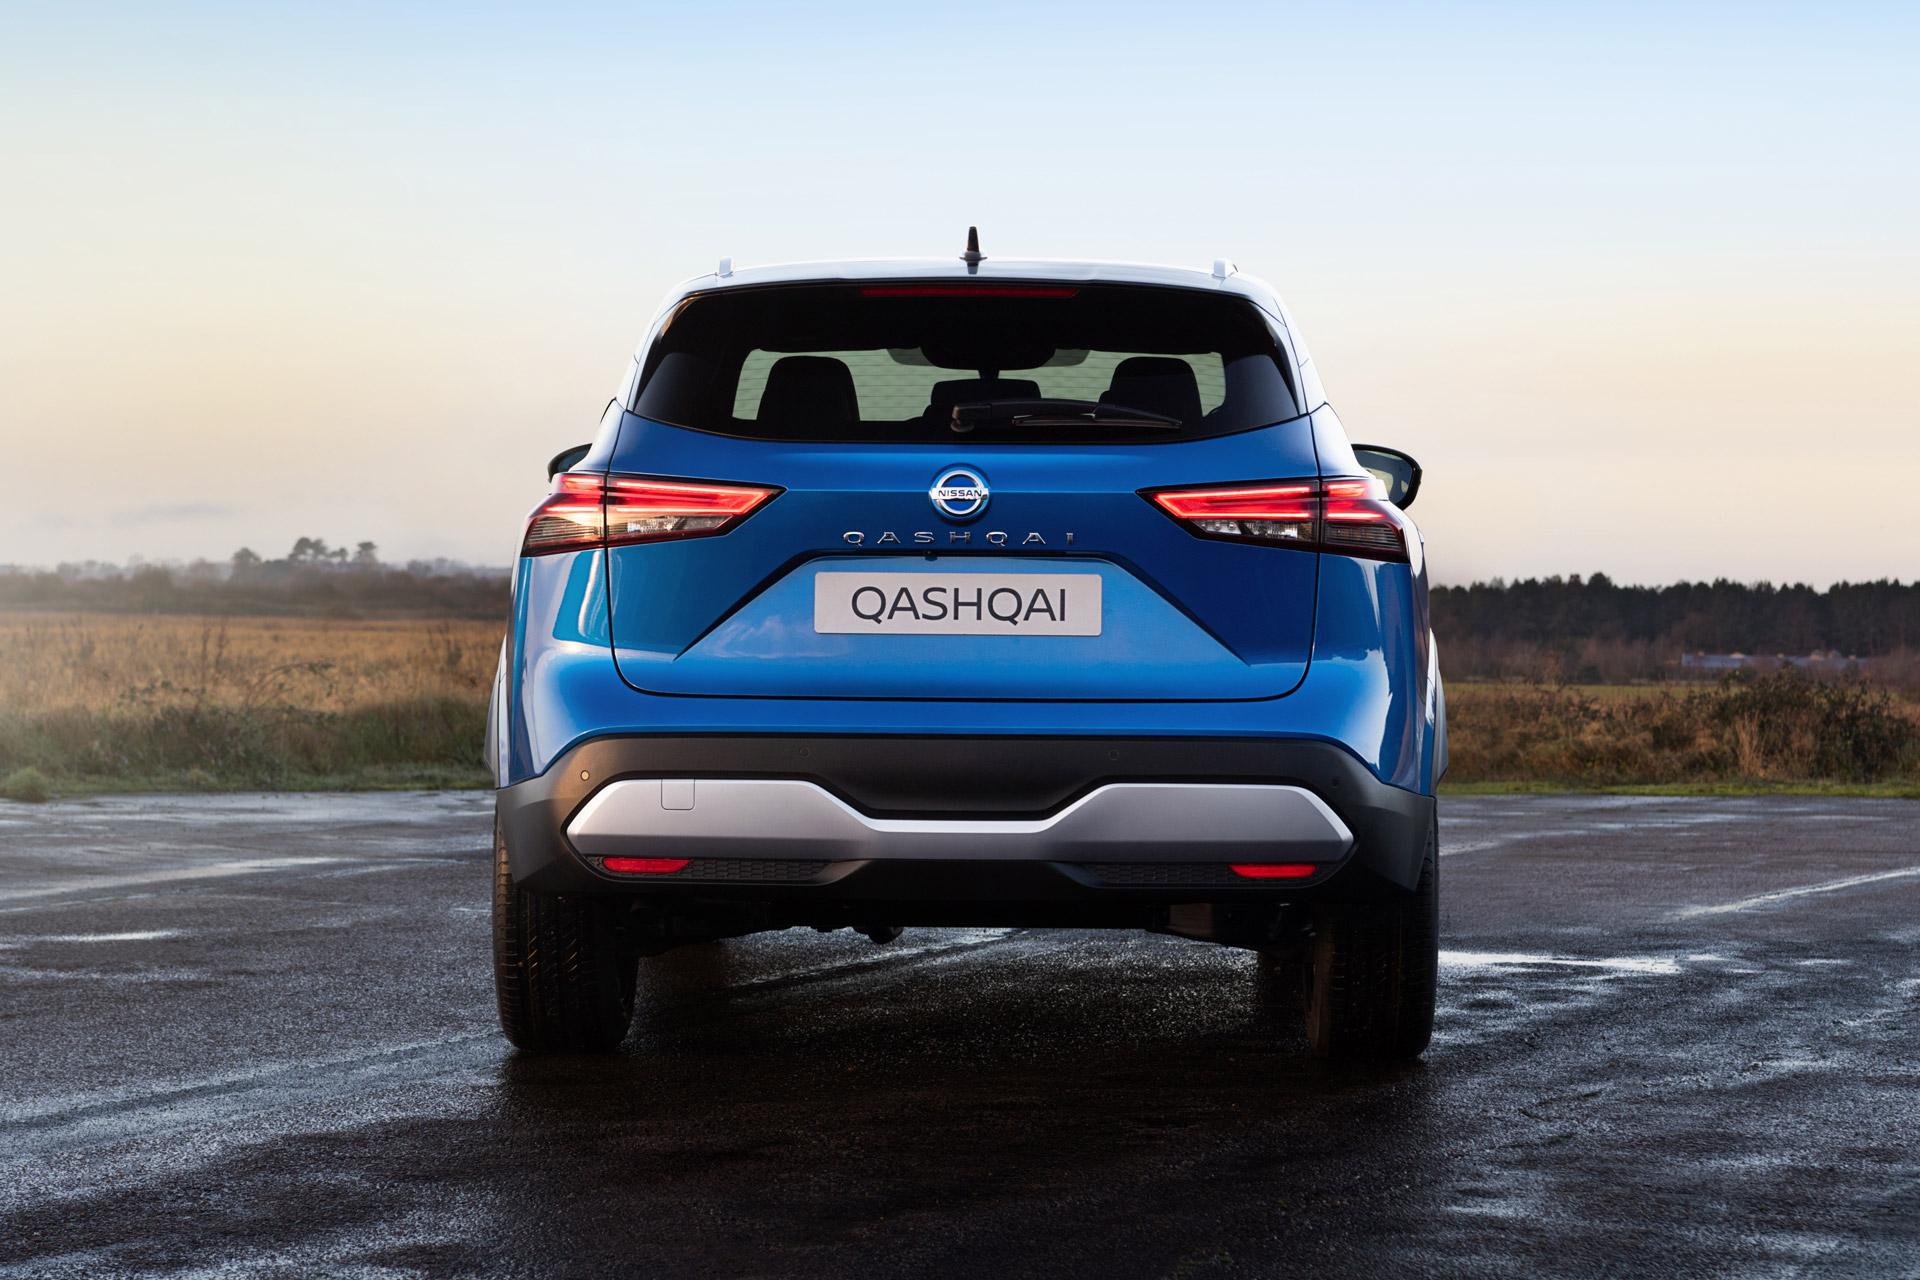 Nissan Qashqai 2021 bagfra